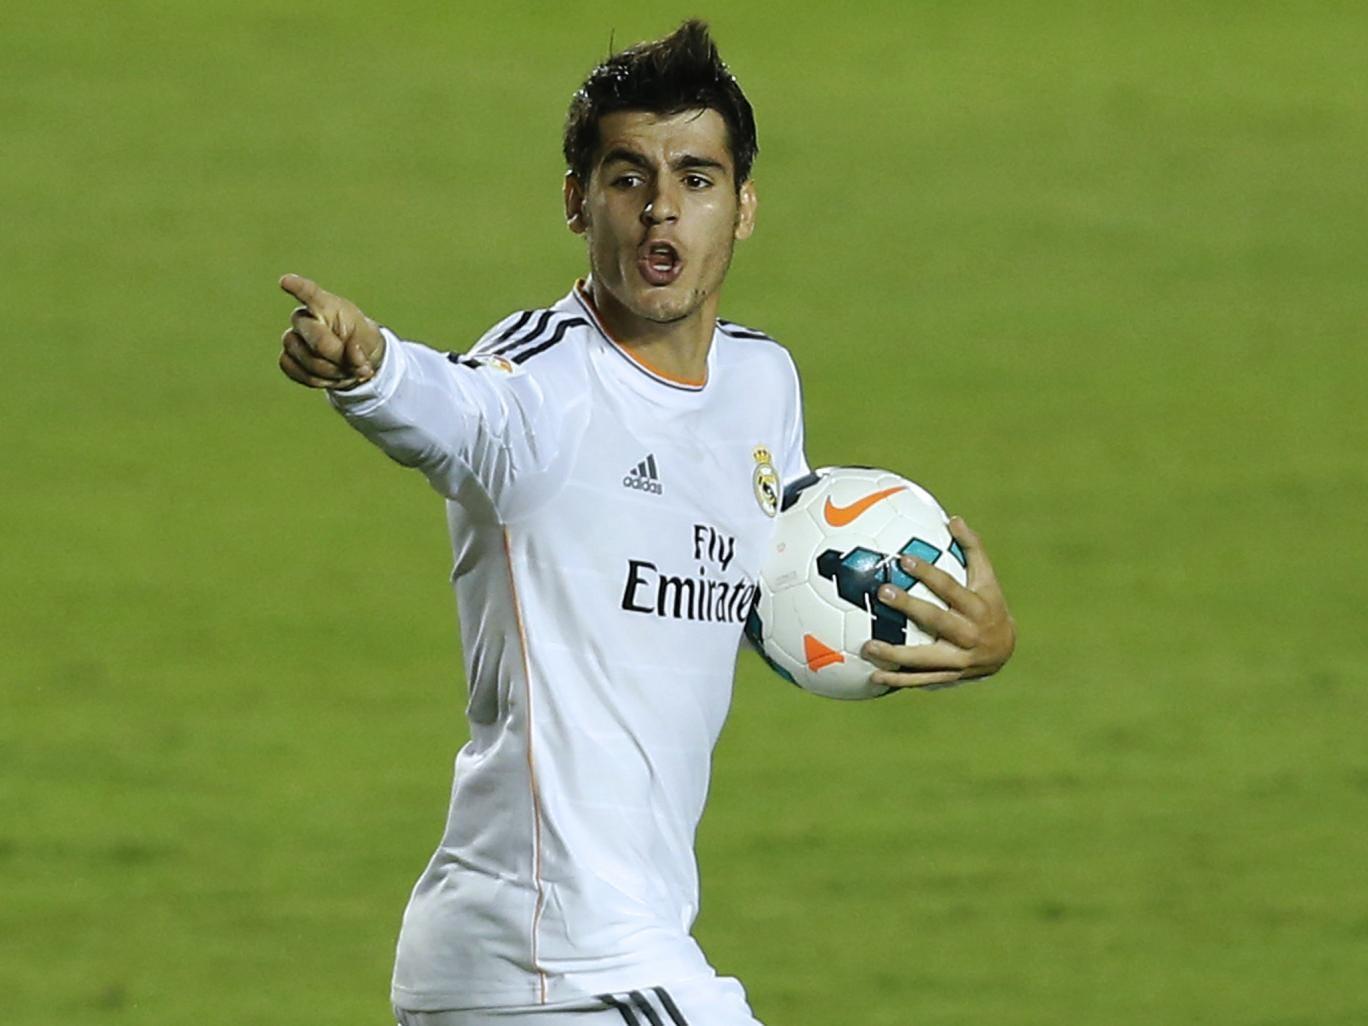 Real Madrid striker Alvaro Morata remains a transfer target for Arsenal